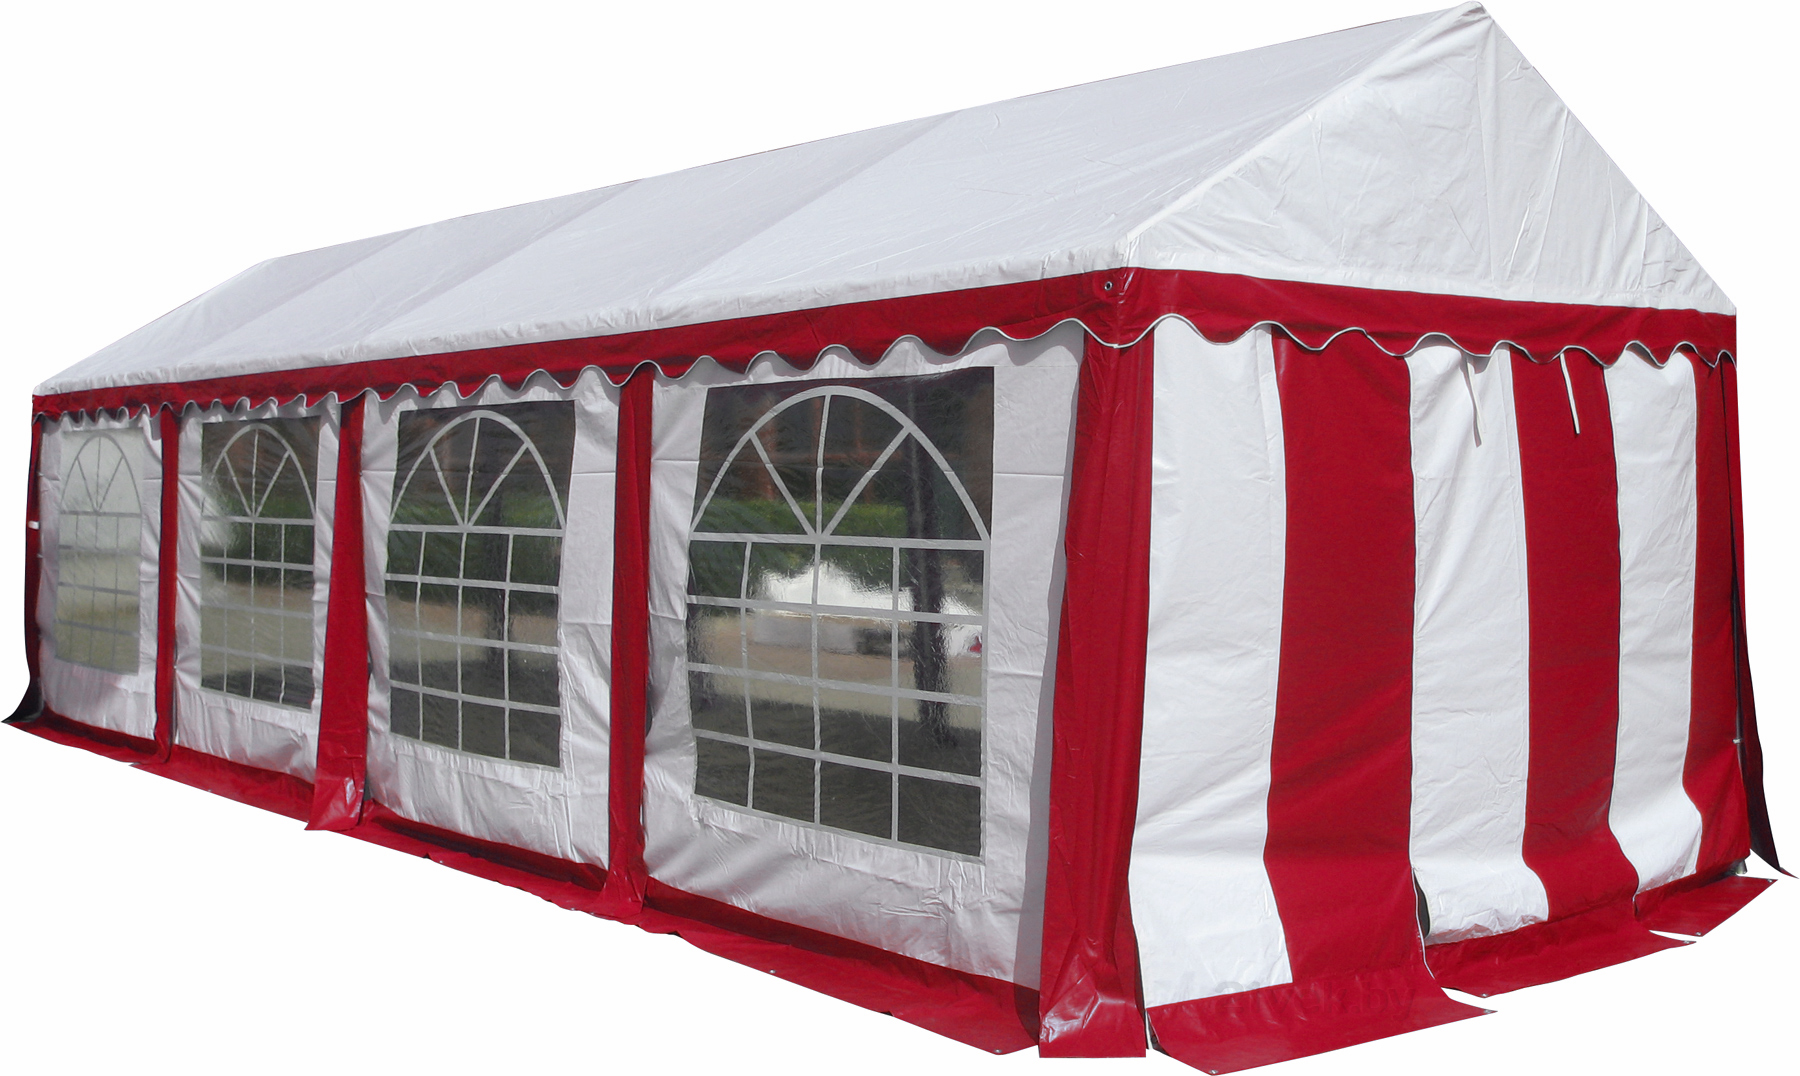 Купить Тент-шатер Sundays, P38201R, Китай